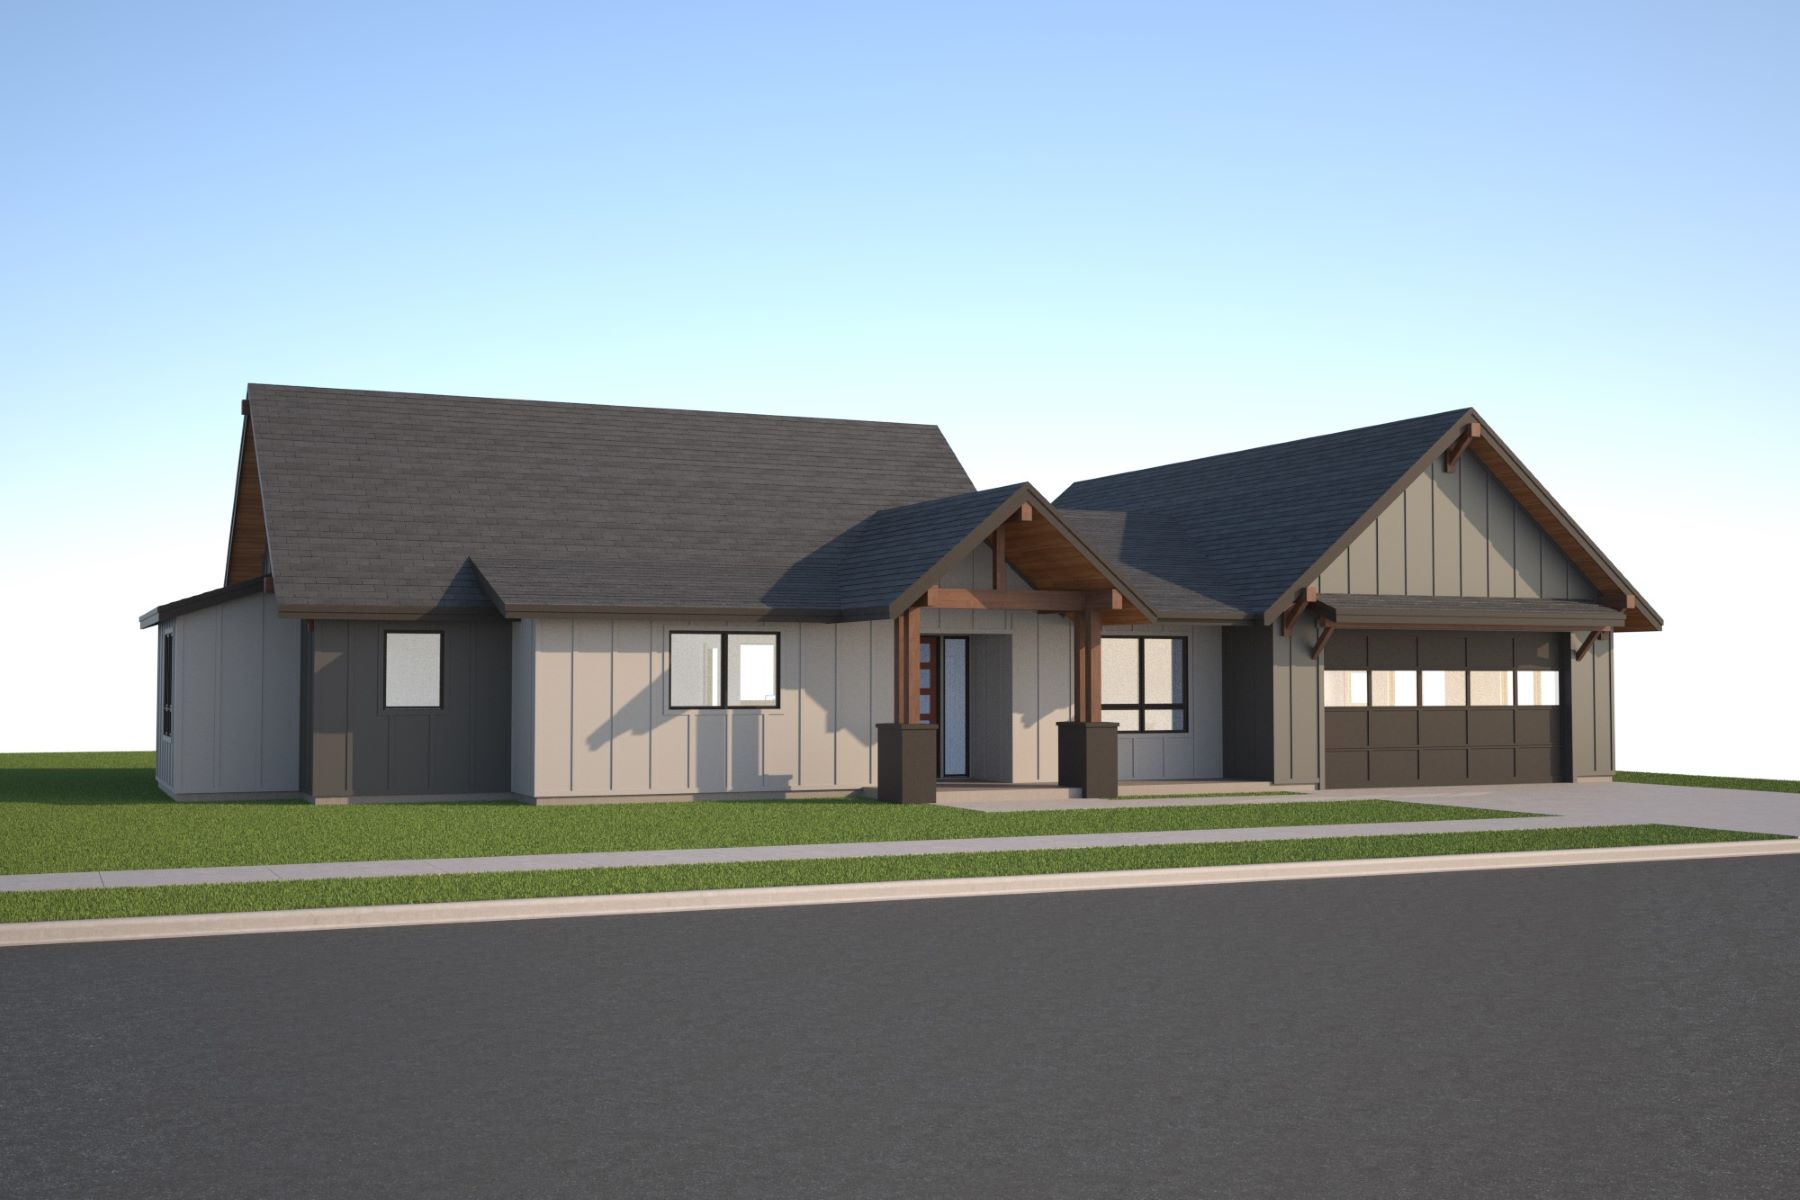 Single Family Home for Sale at 2952 Prada Dr , Missoula, MT 59808 2952 Prada Dr Missoula, Montana 59808 United States